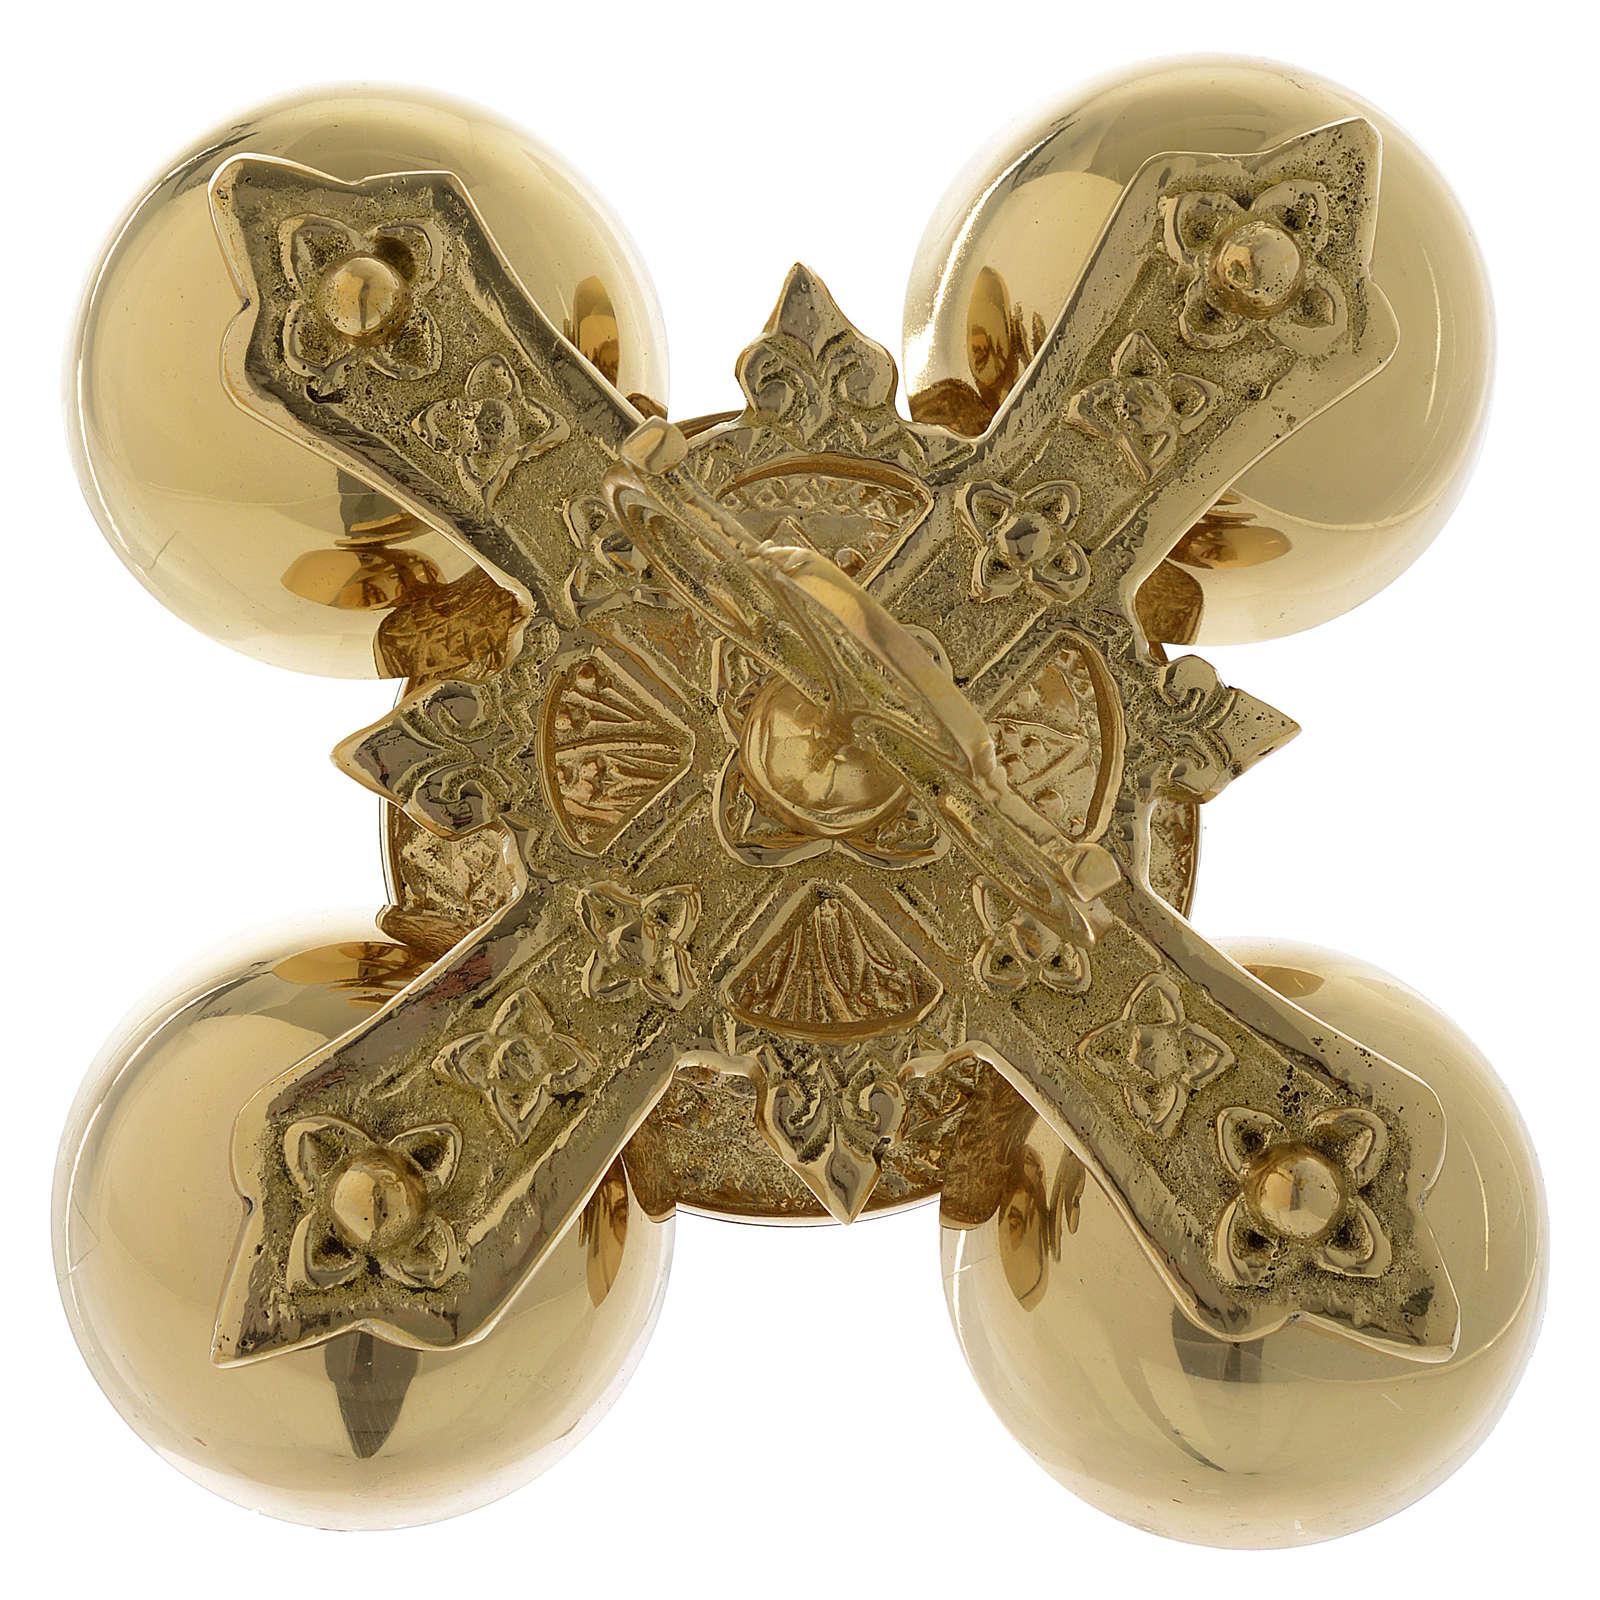 Campanilla litúrgica cuatro sonidos latón dorado 3